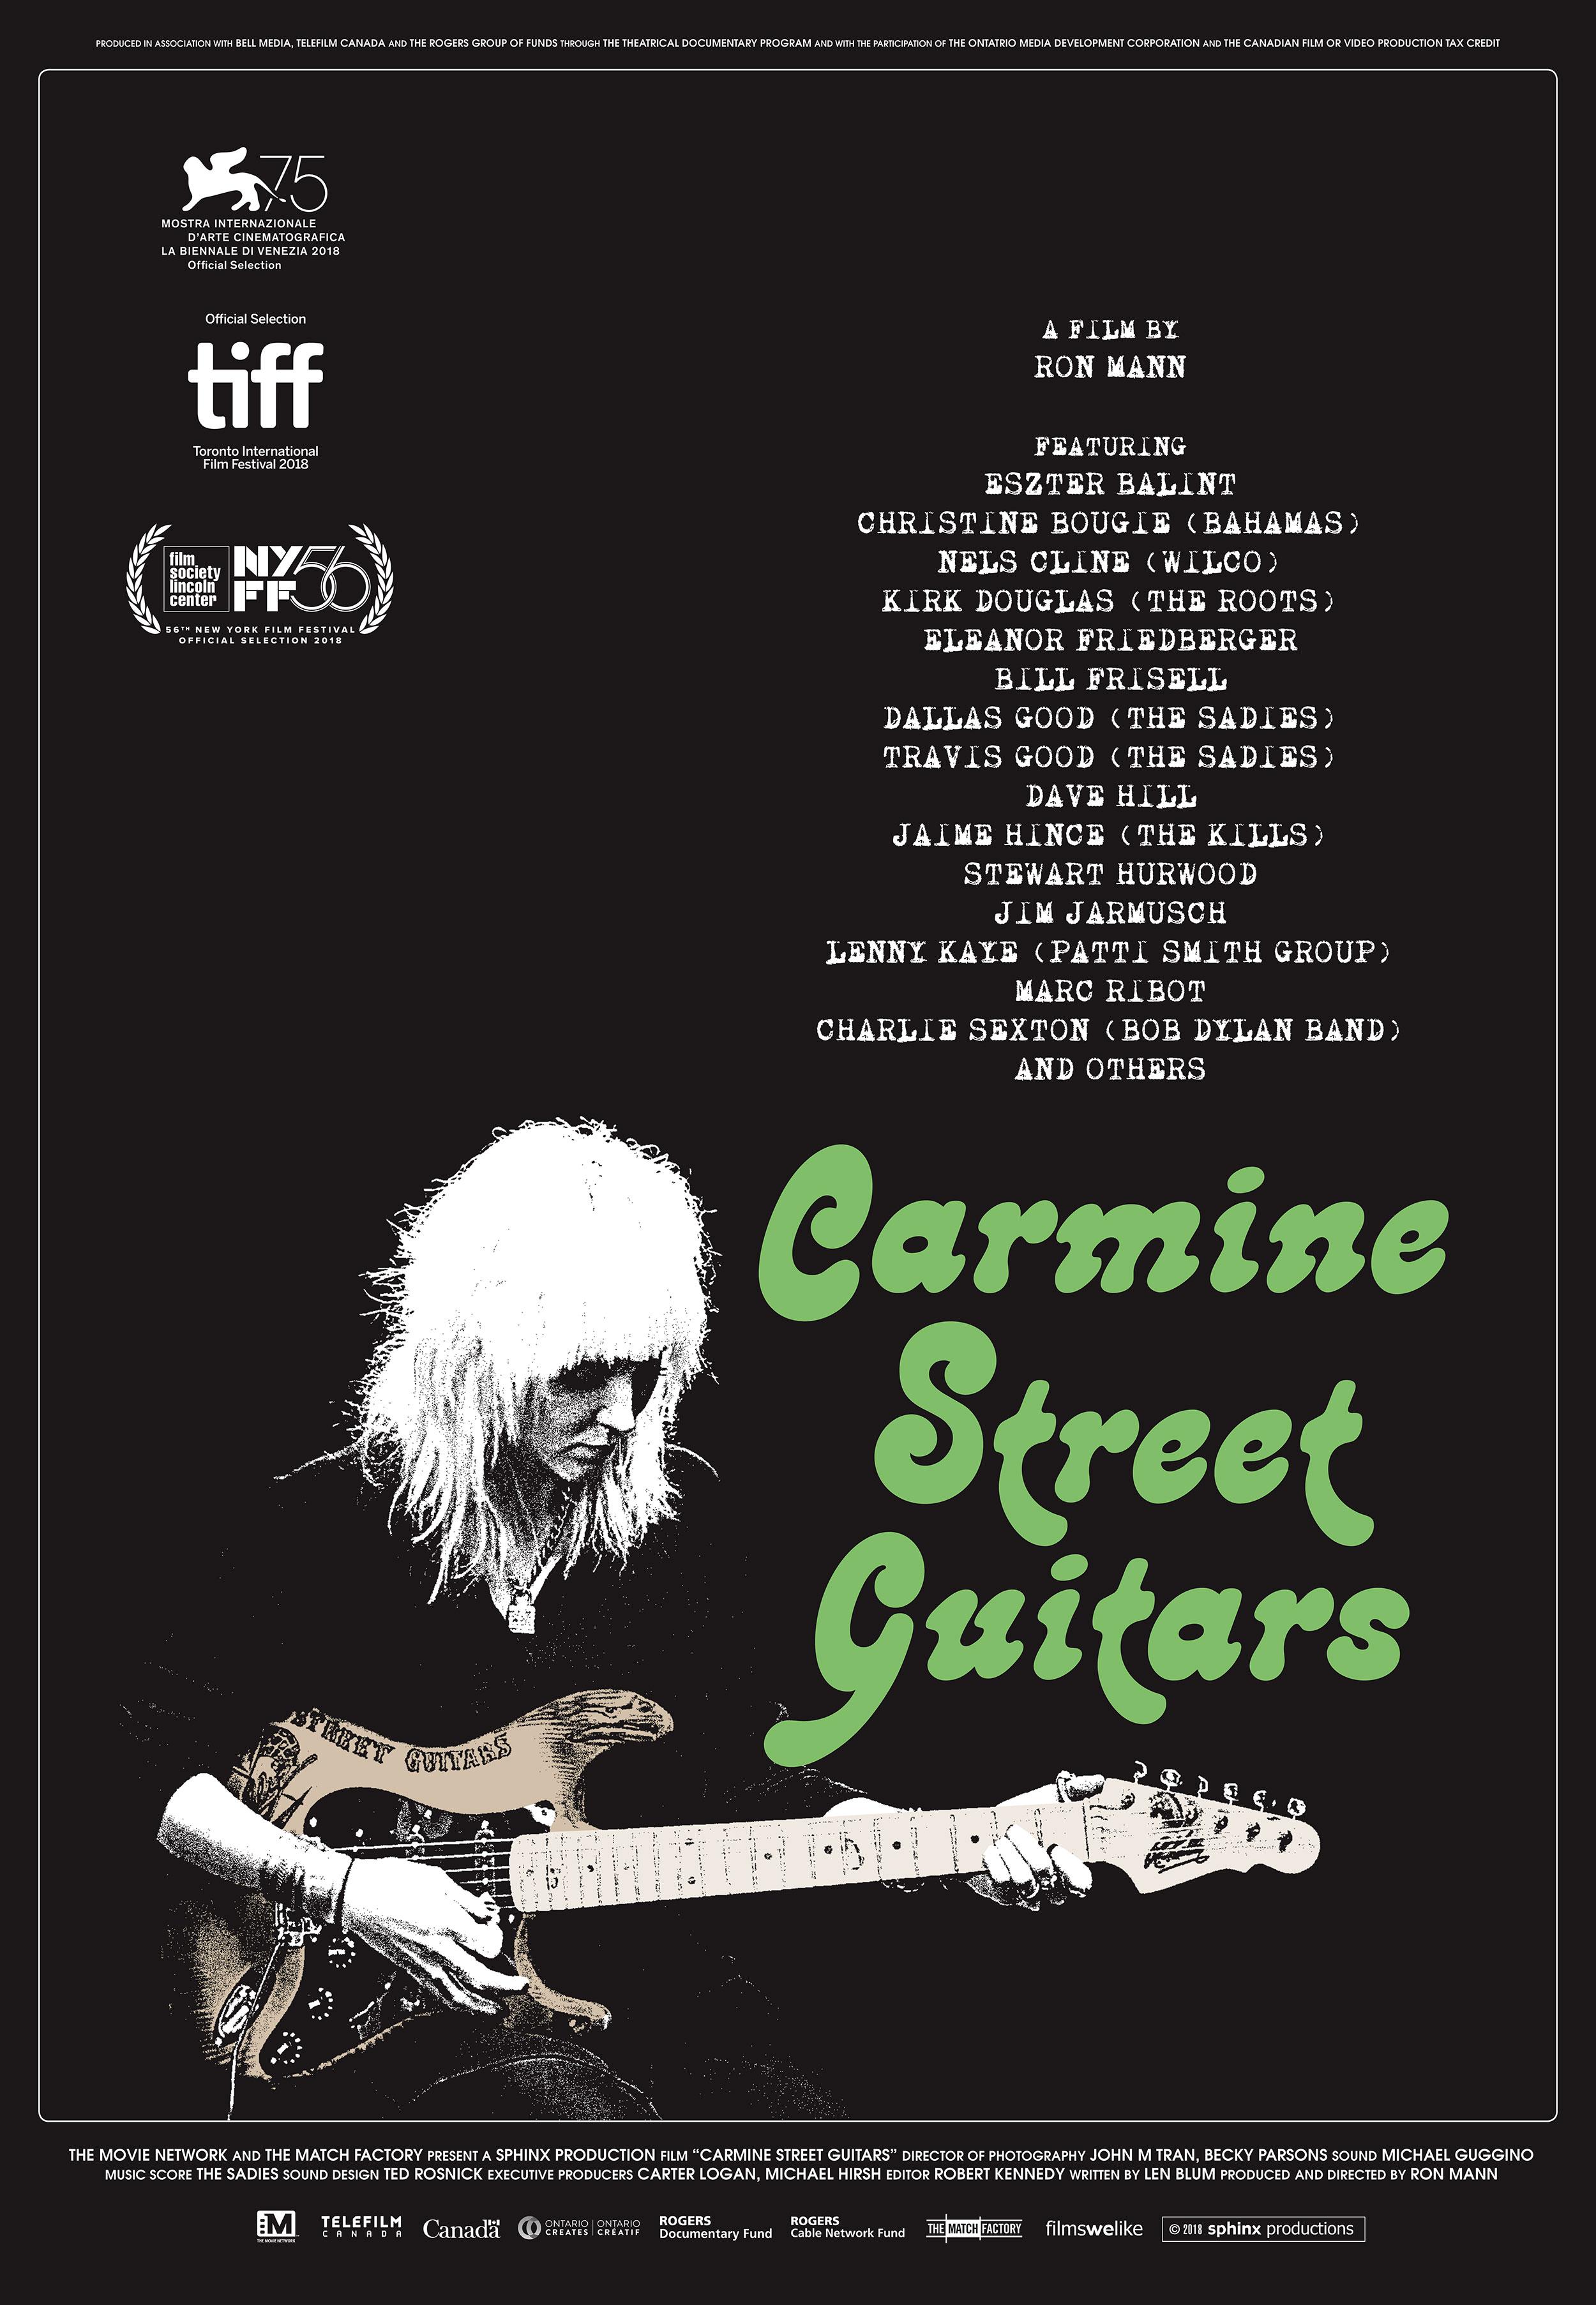 CSG_Poster_Venice_TIFF_NYFF_Large2500.jpg